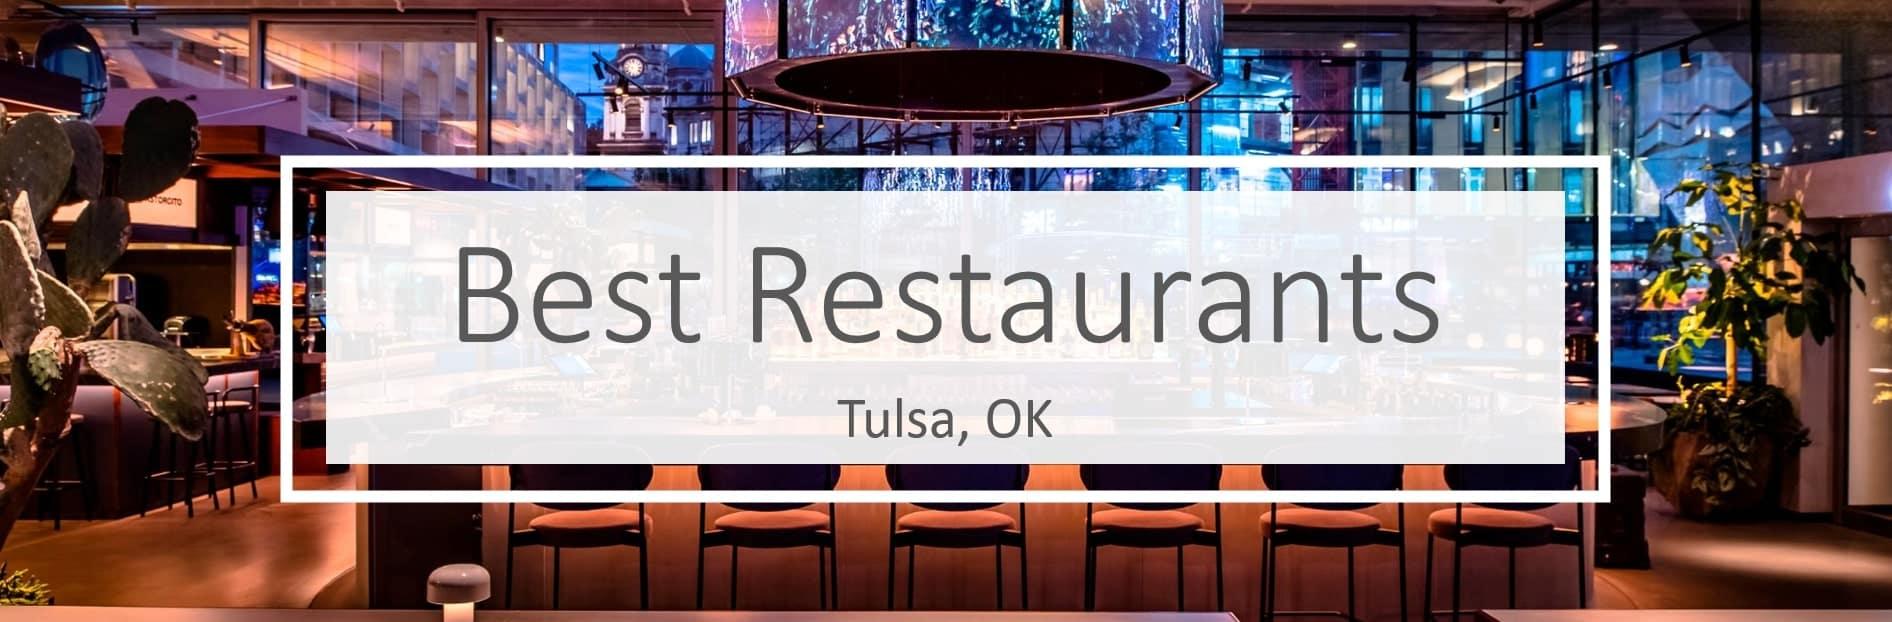 best restaurants in Tulsa